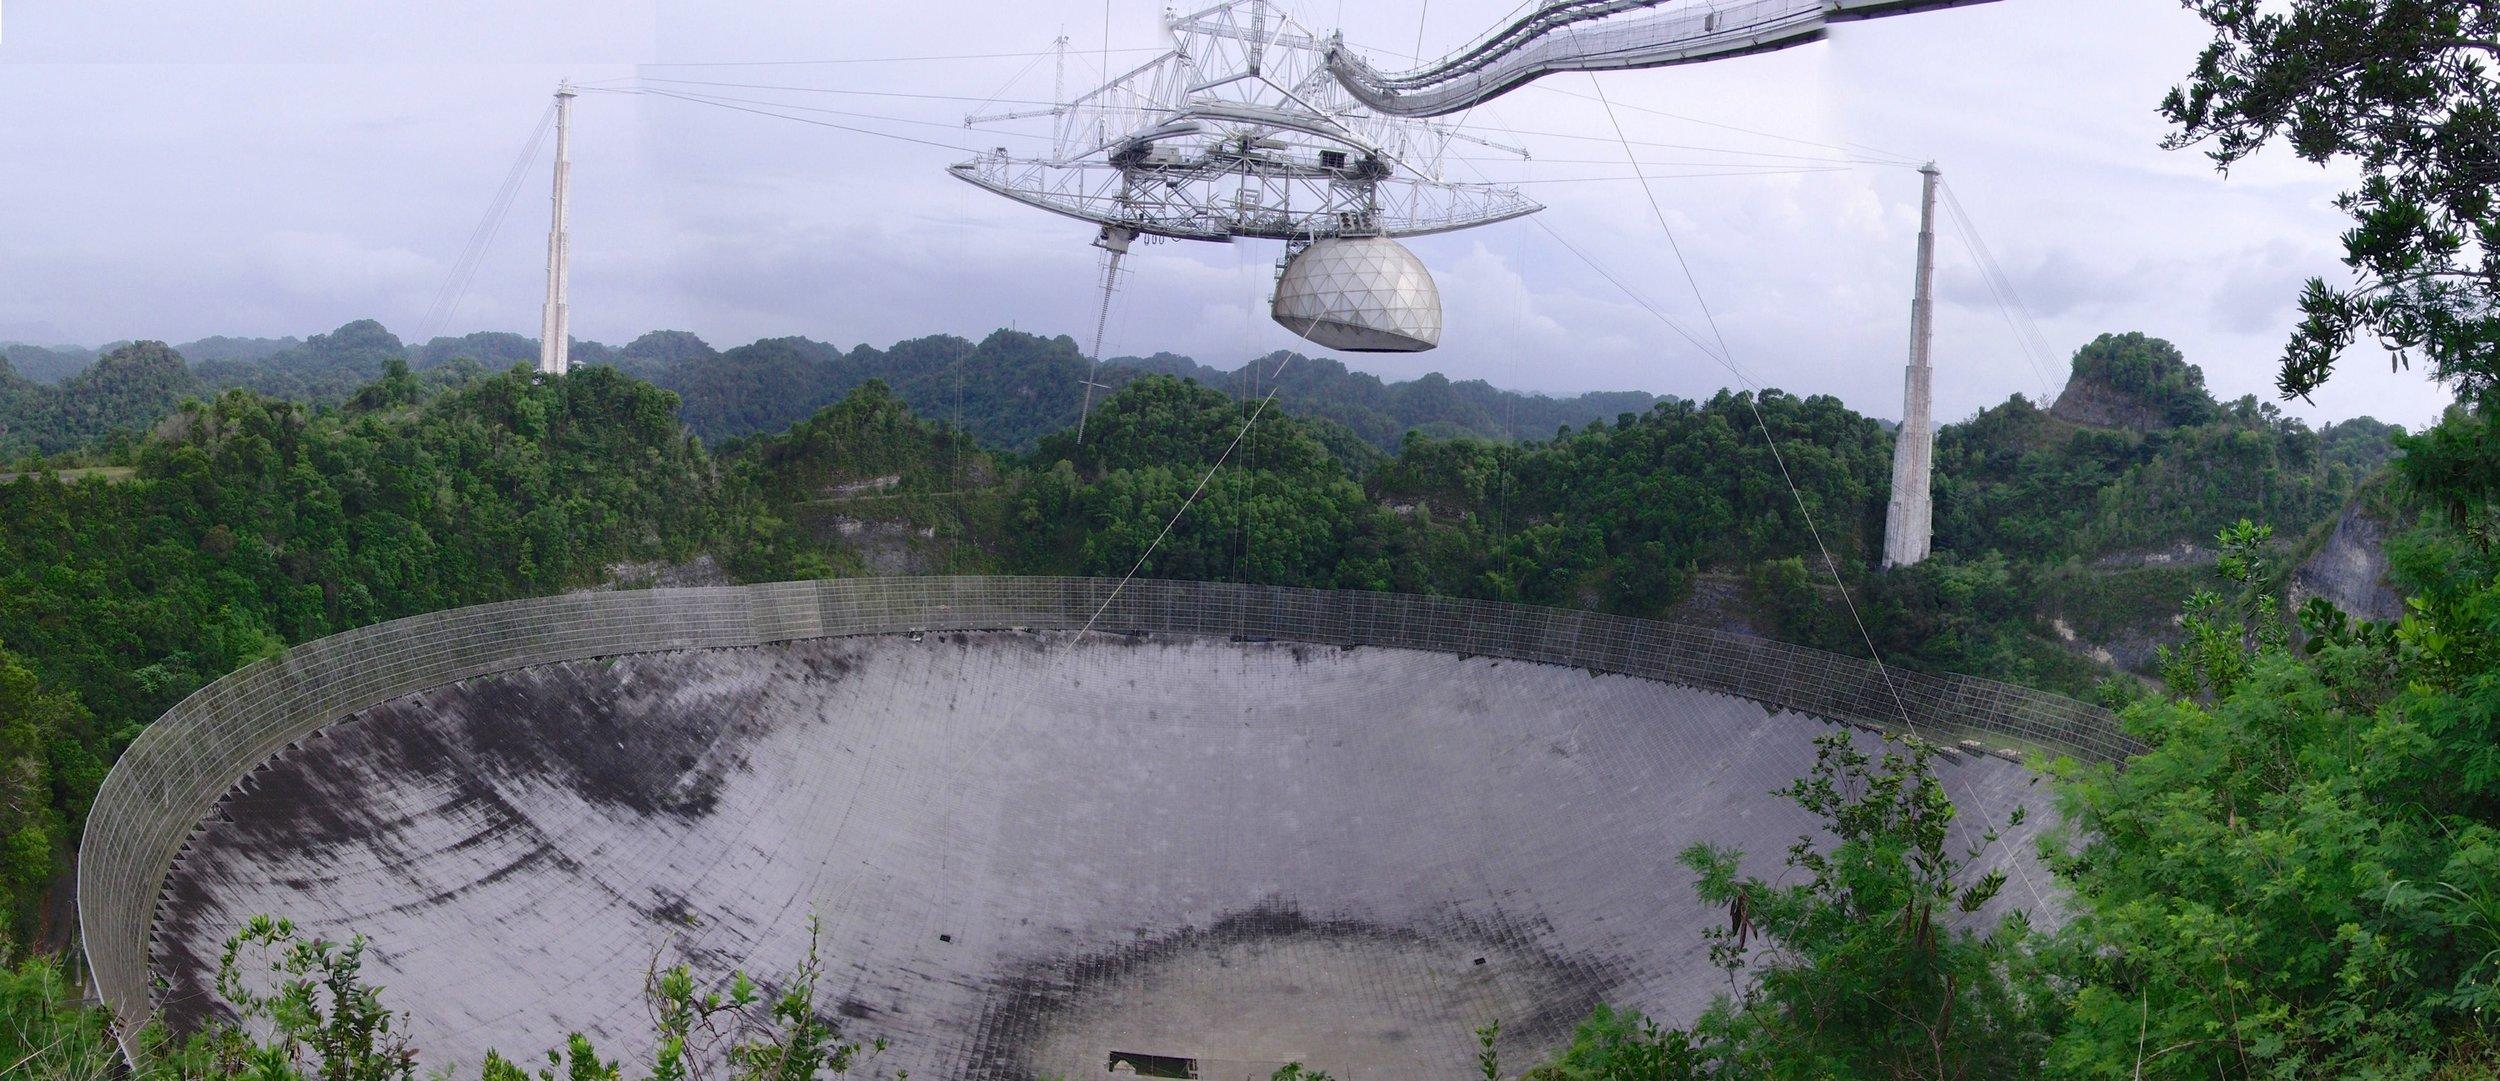 Arecibo radio telescope in Puerto Rico